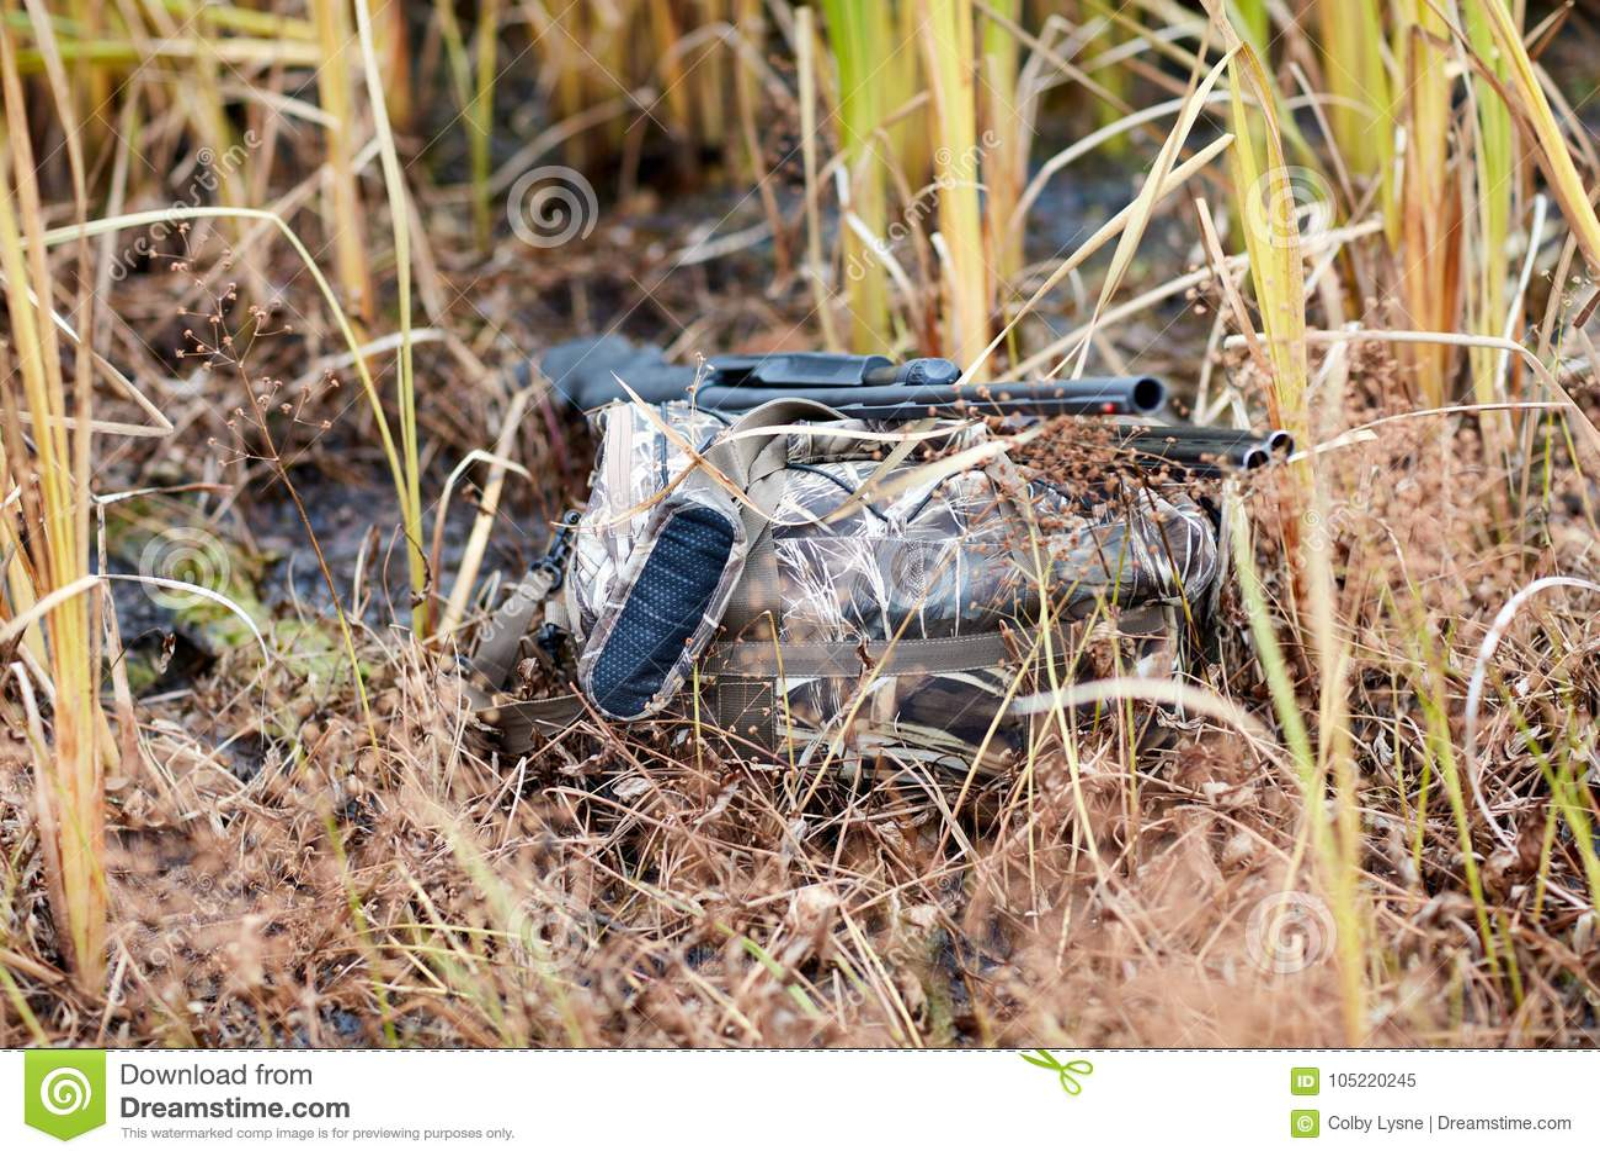 Stealthy duck hunter hidden among swamp plants